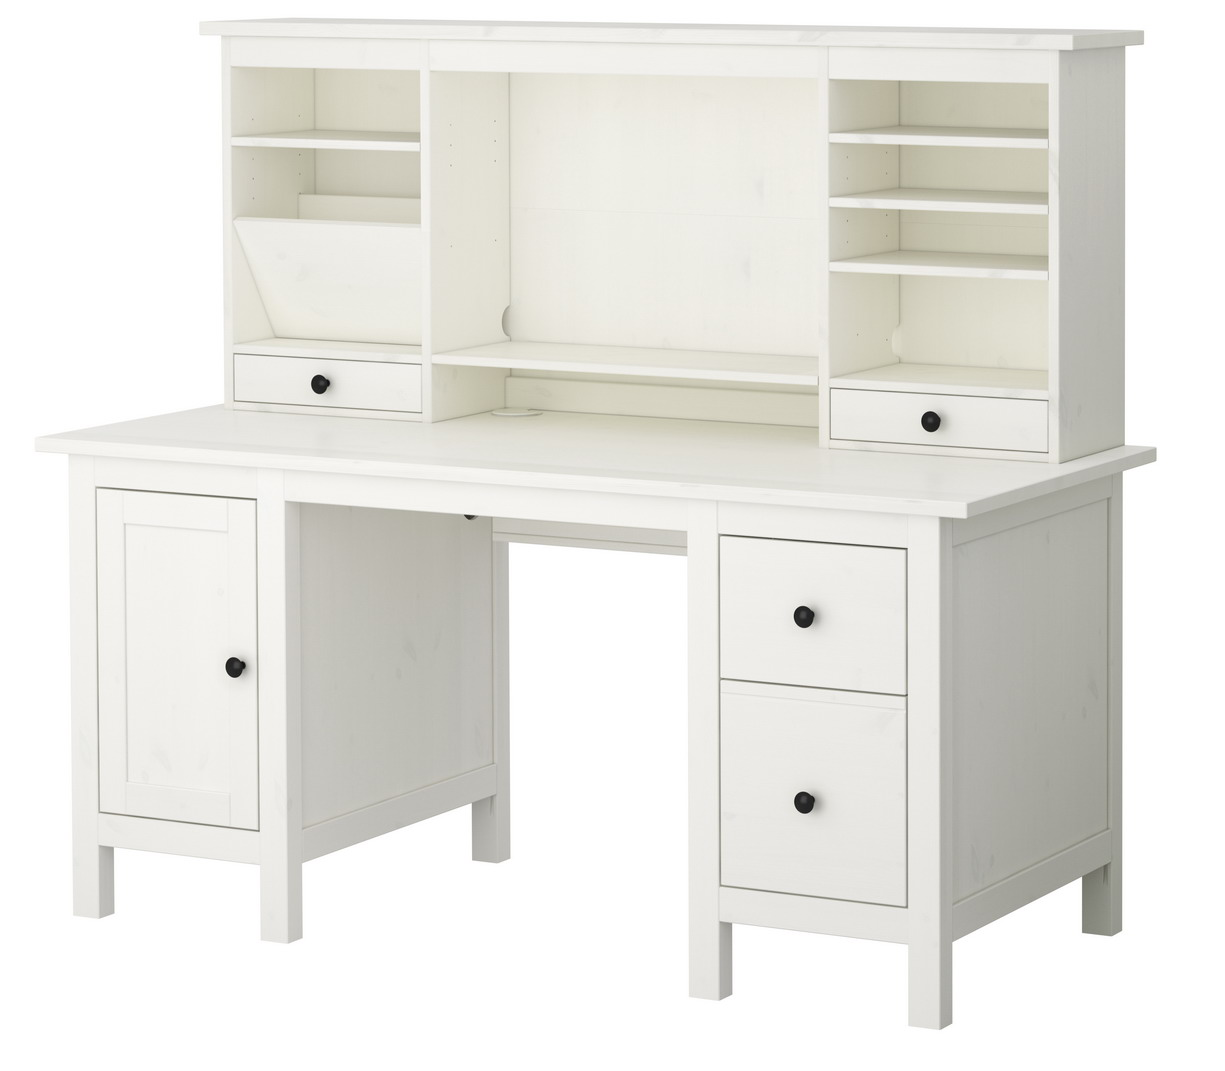 pracovn kout m dn trendy pro eny. Black Bedroom Furniture Sets. Home Design Ideas